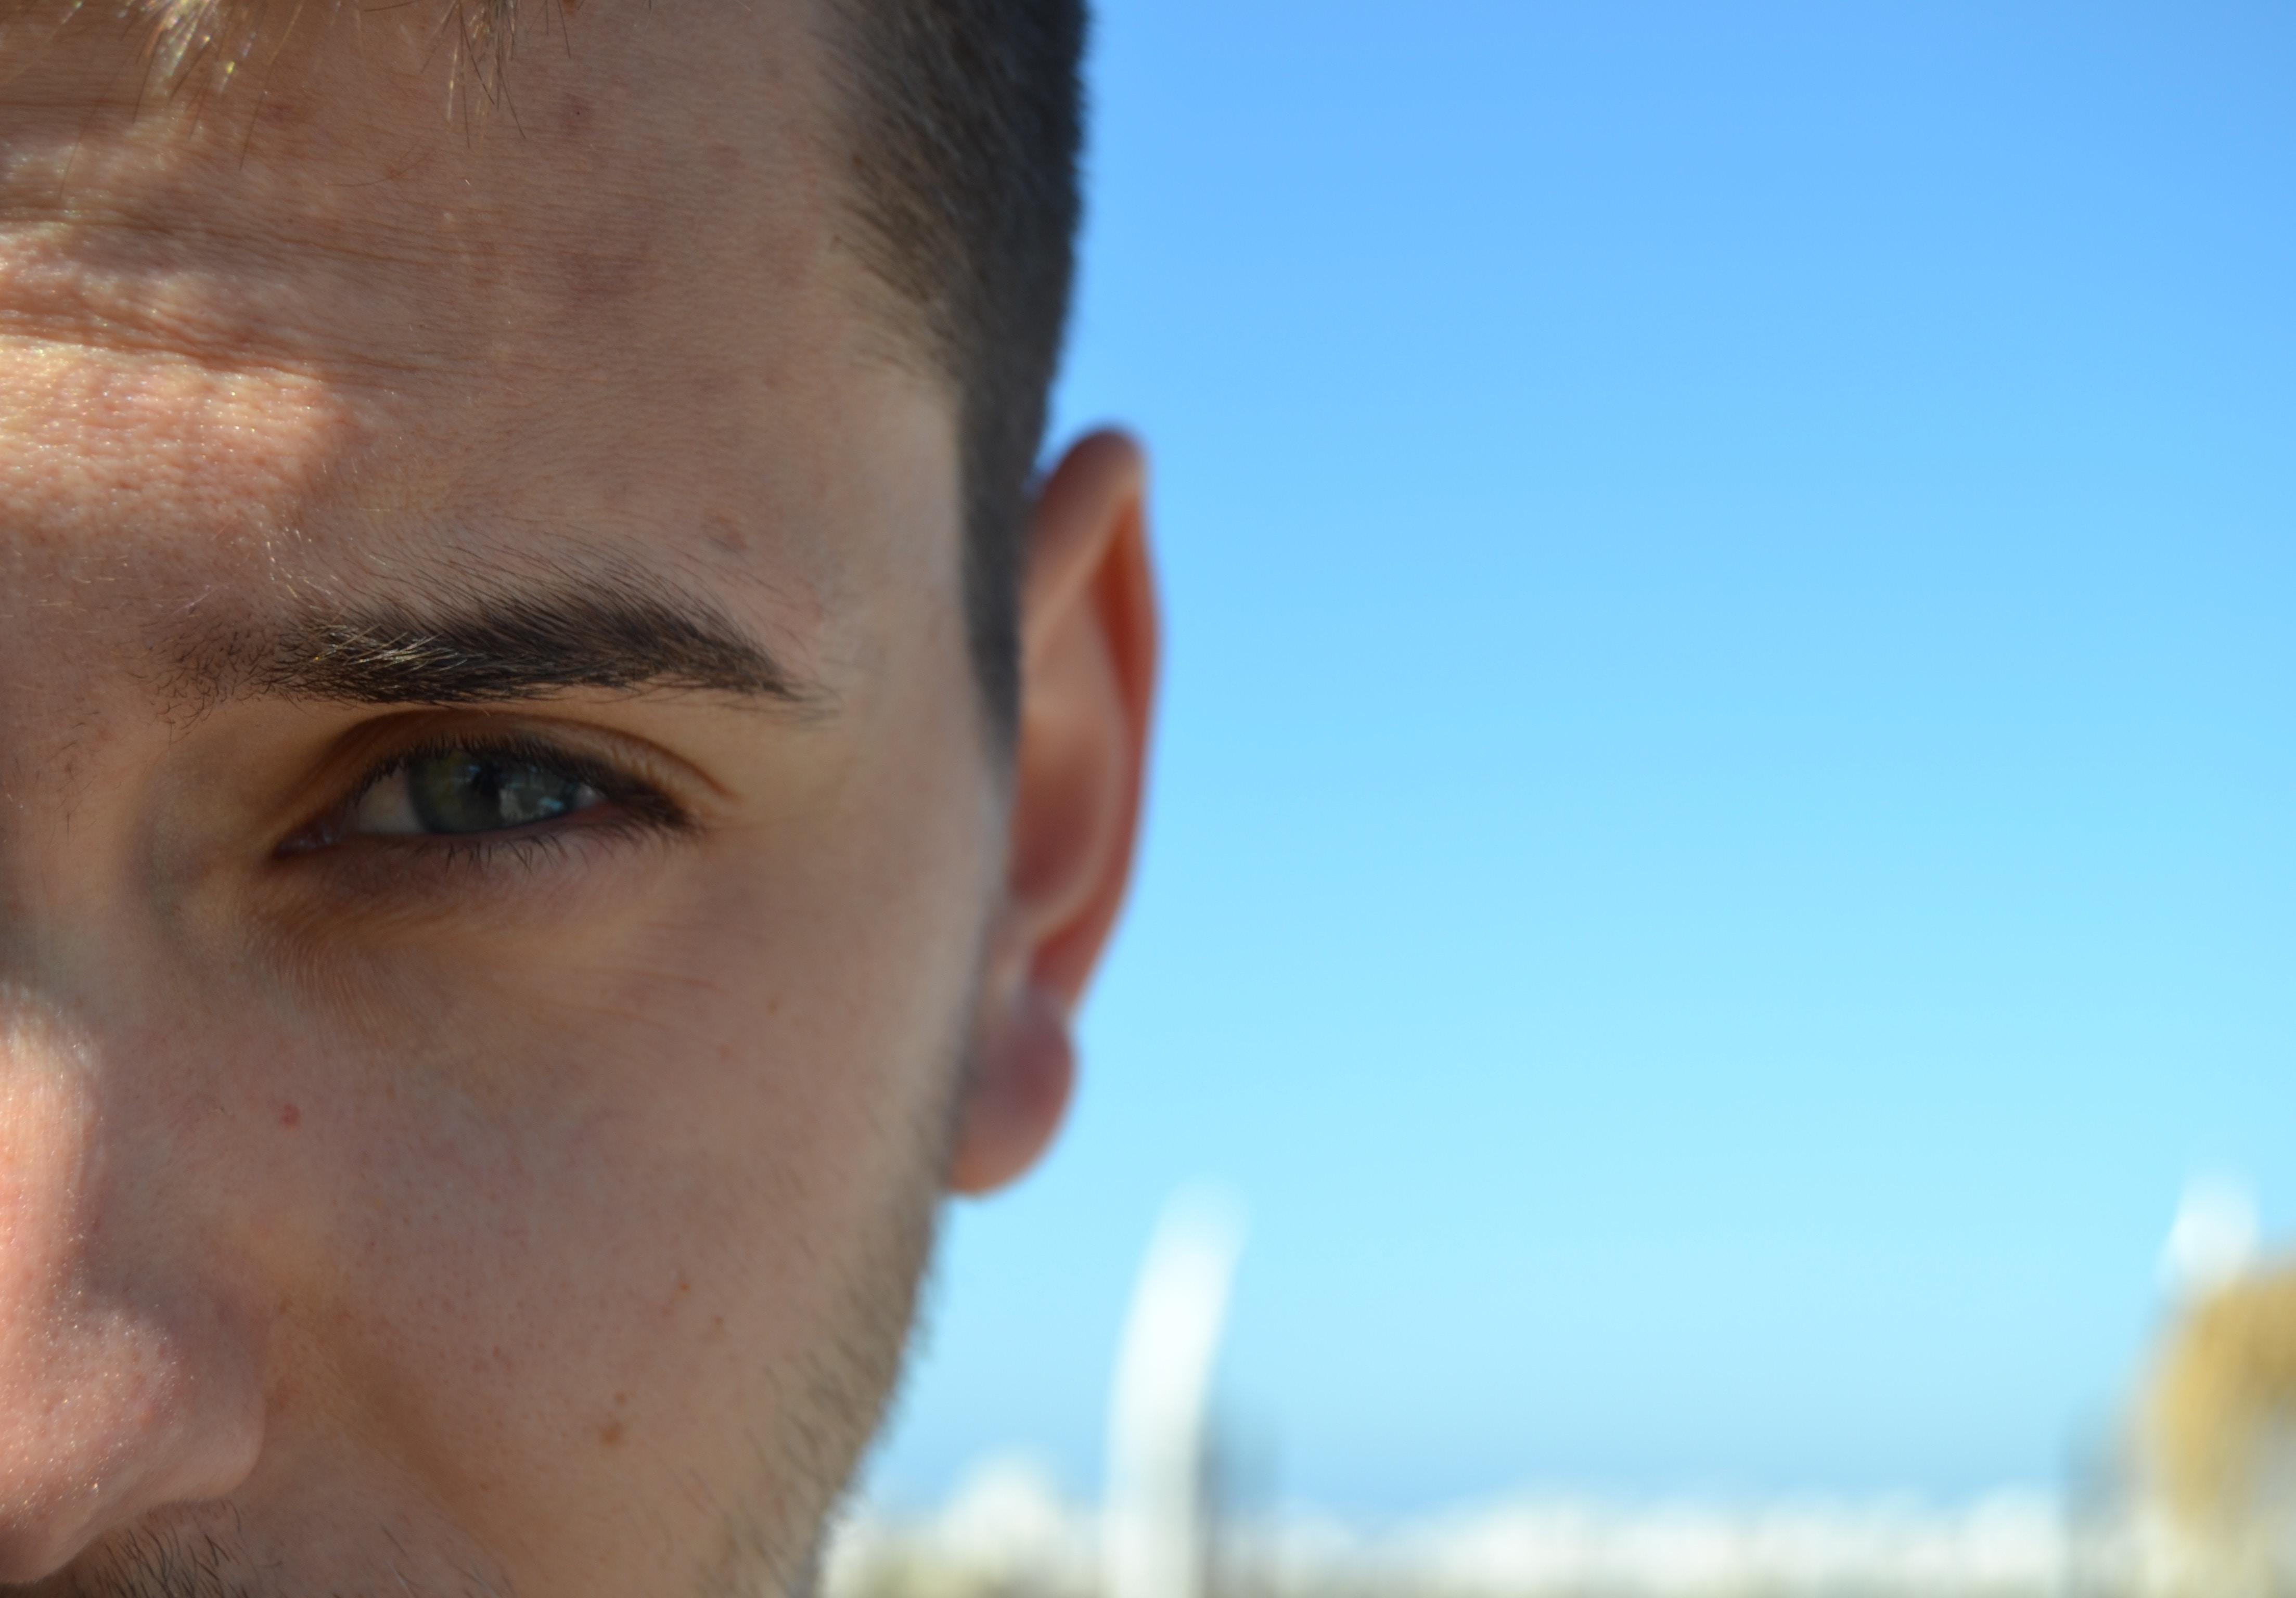 Go to Pablo Alonso's profile